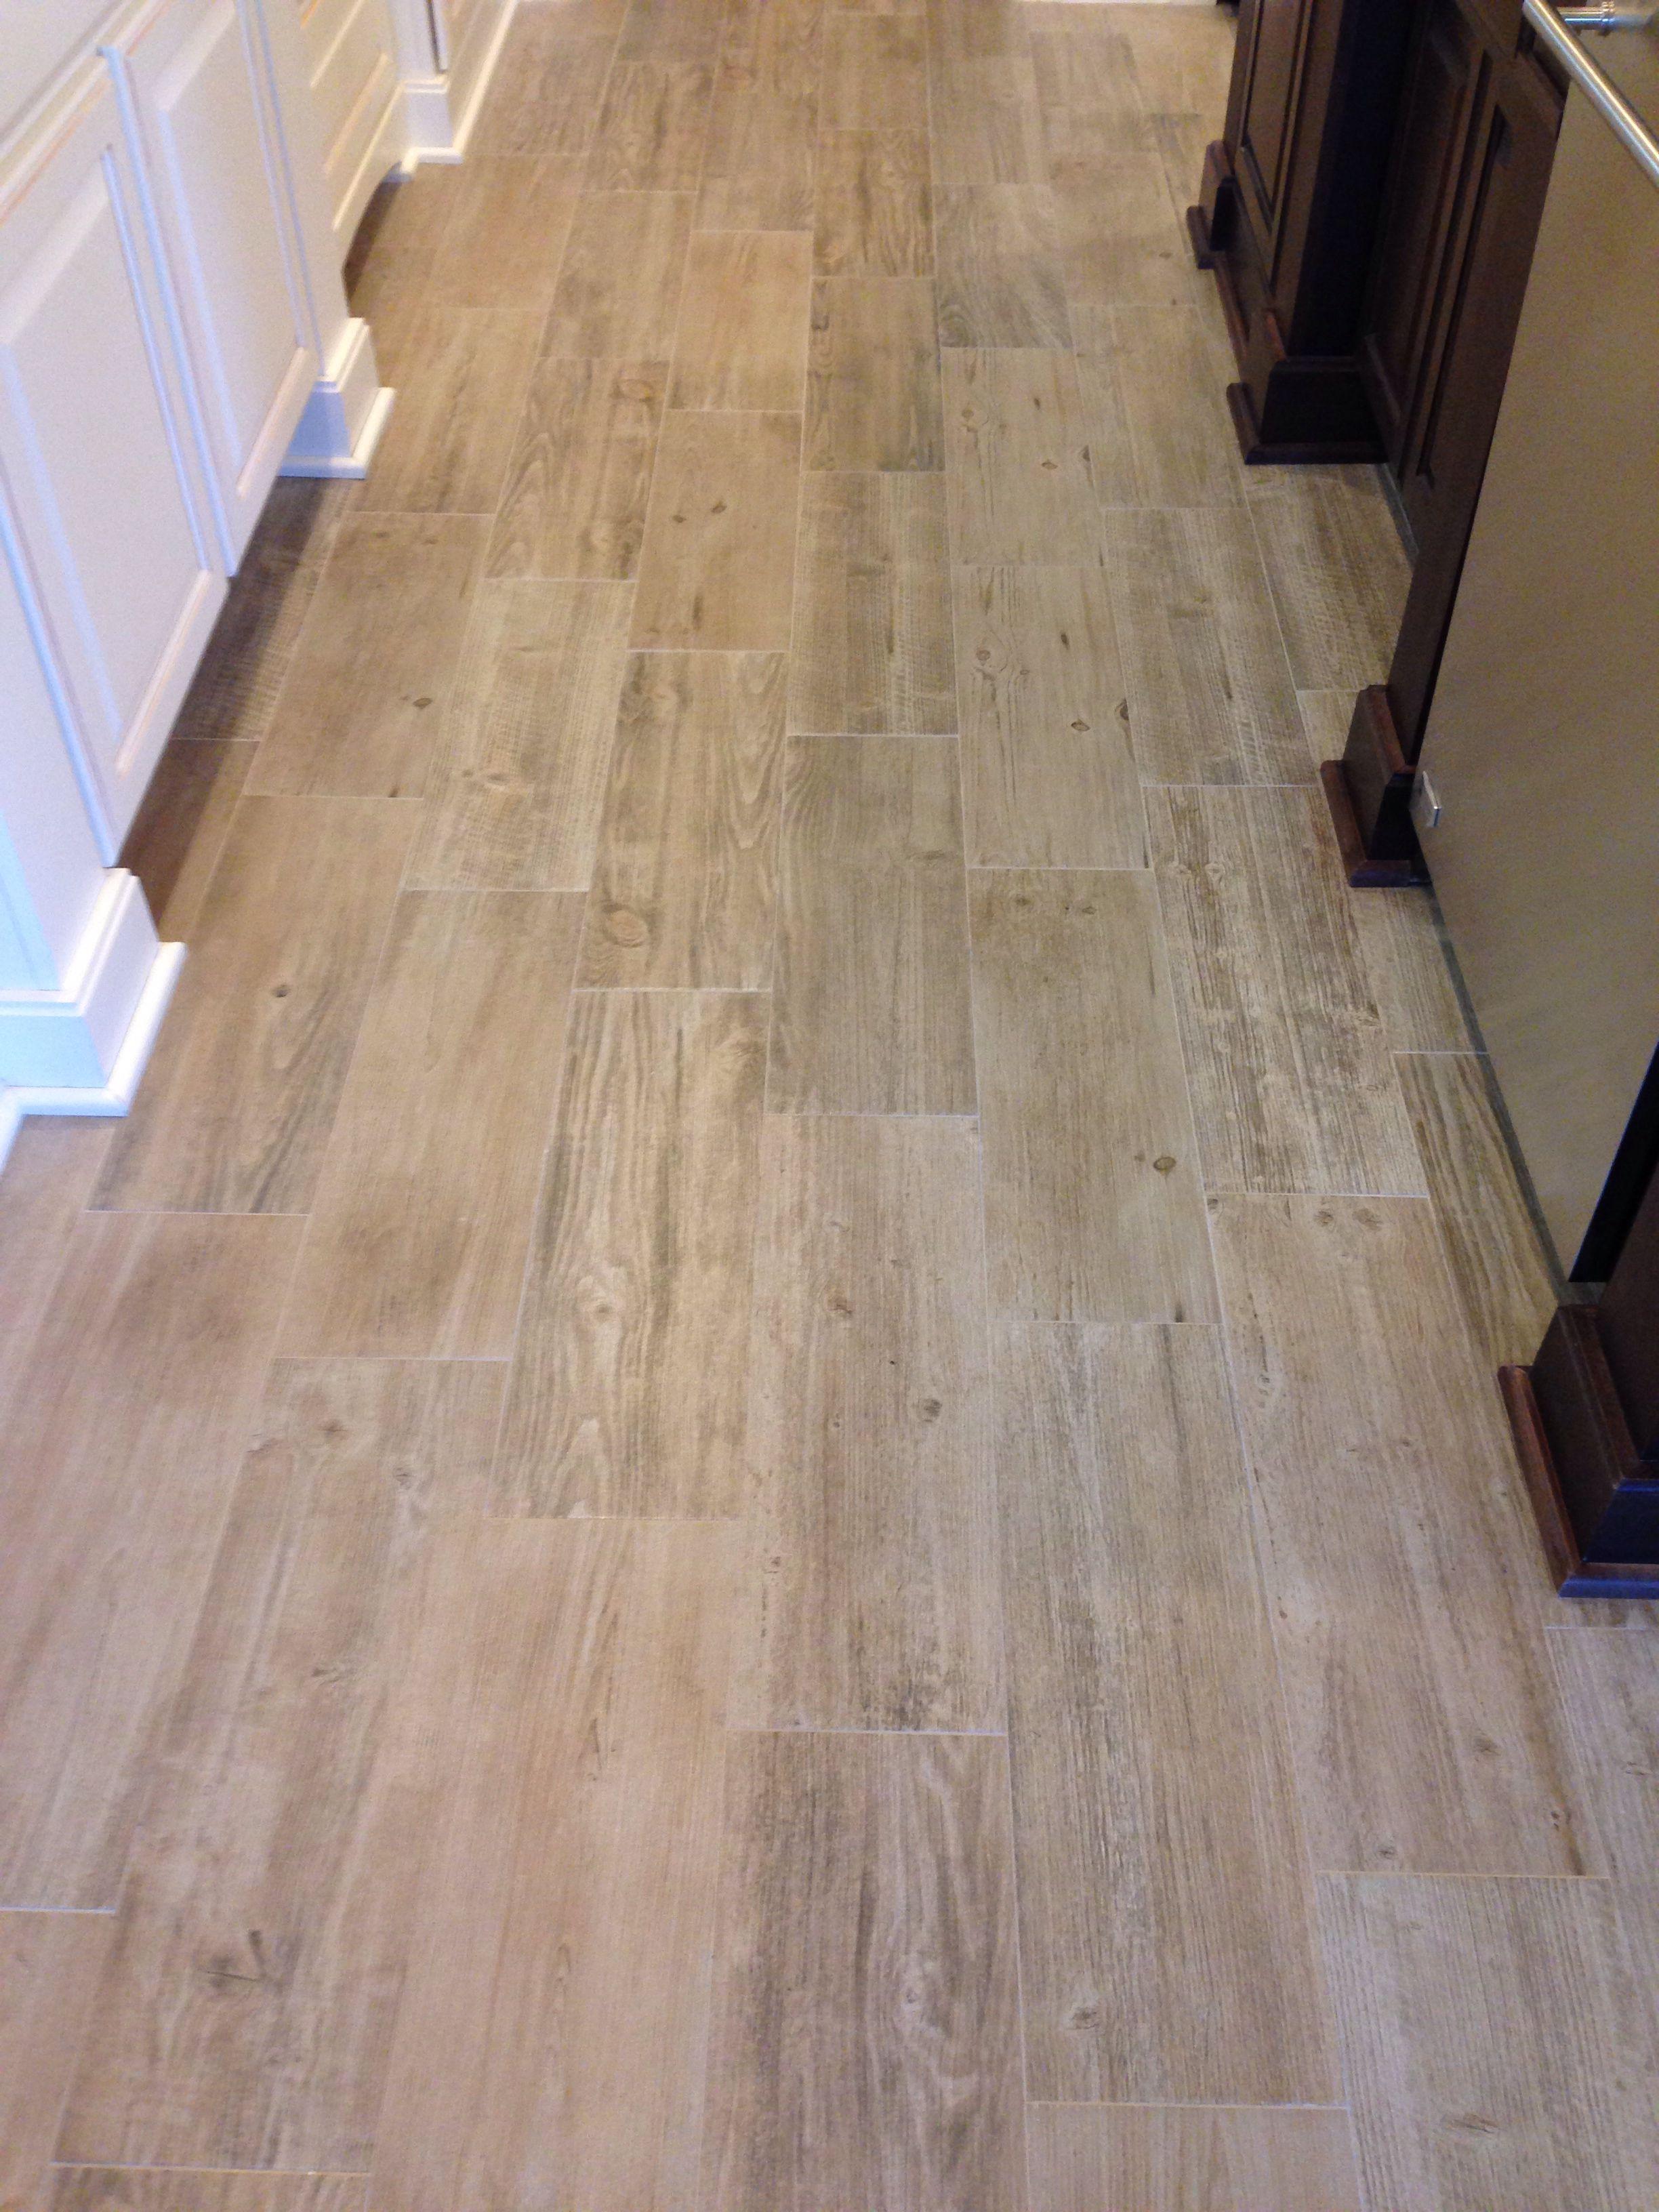 Sunwood Legend Beige Tile With Narrow Grout Lines